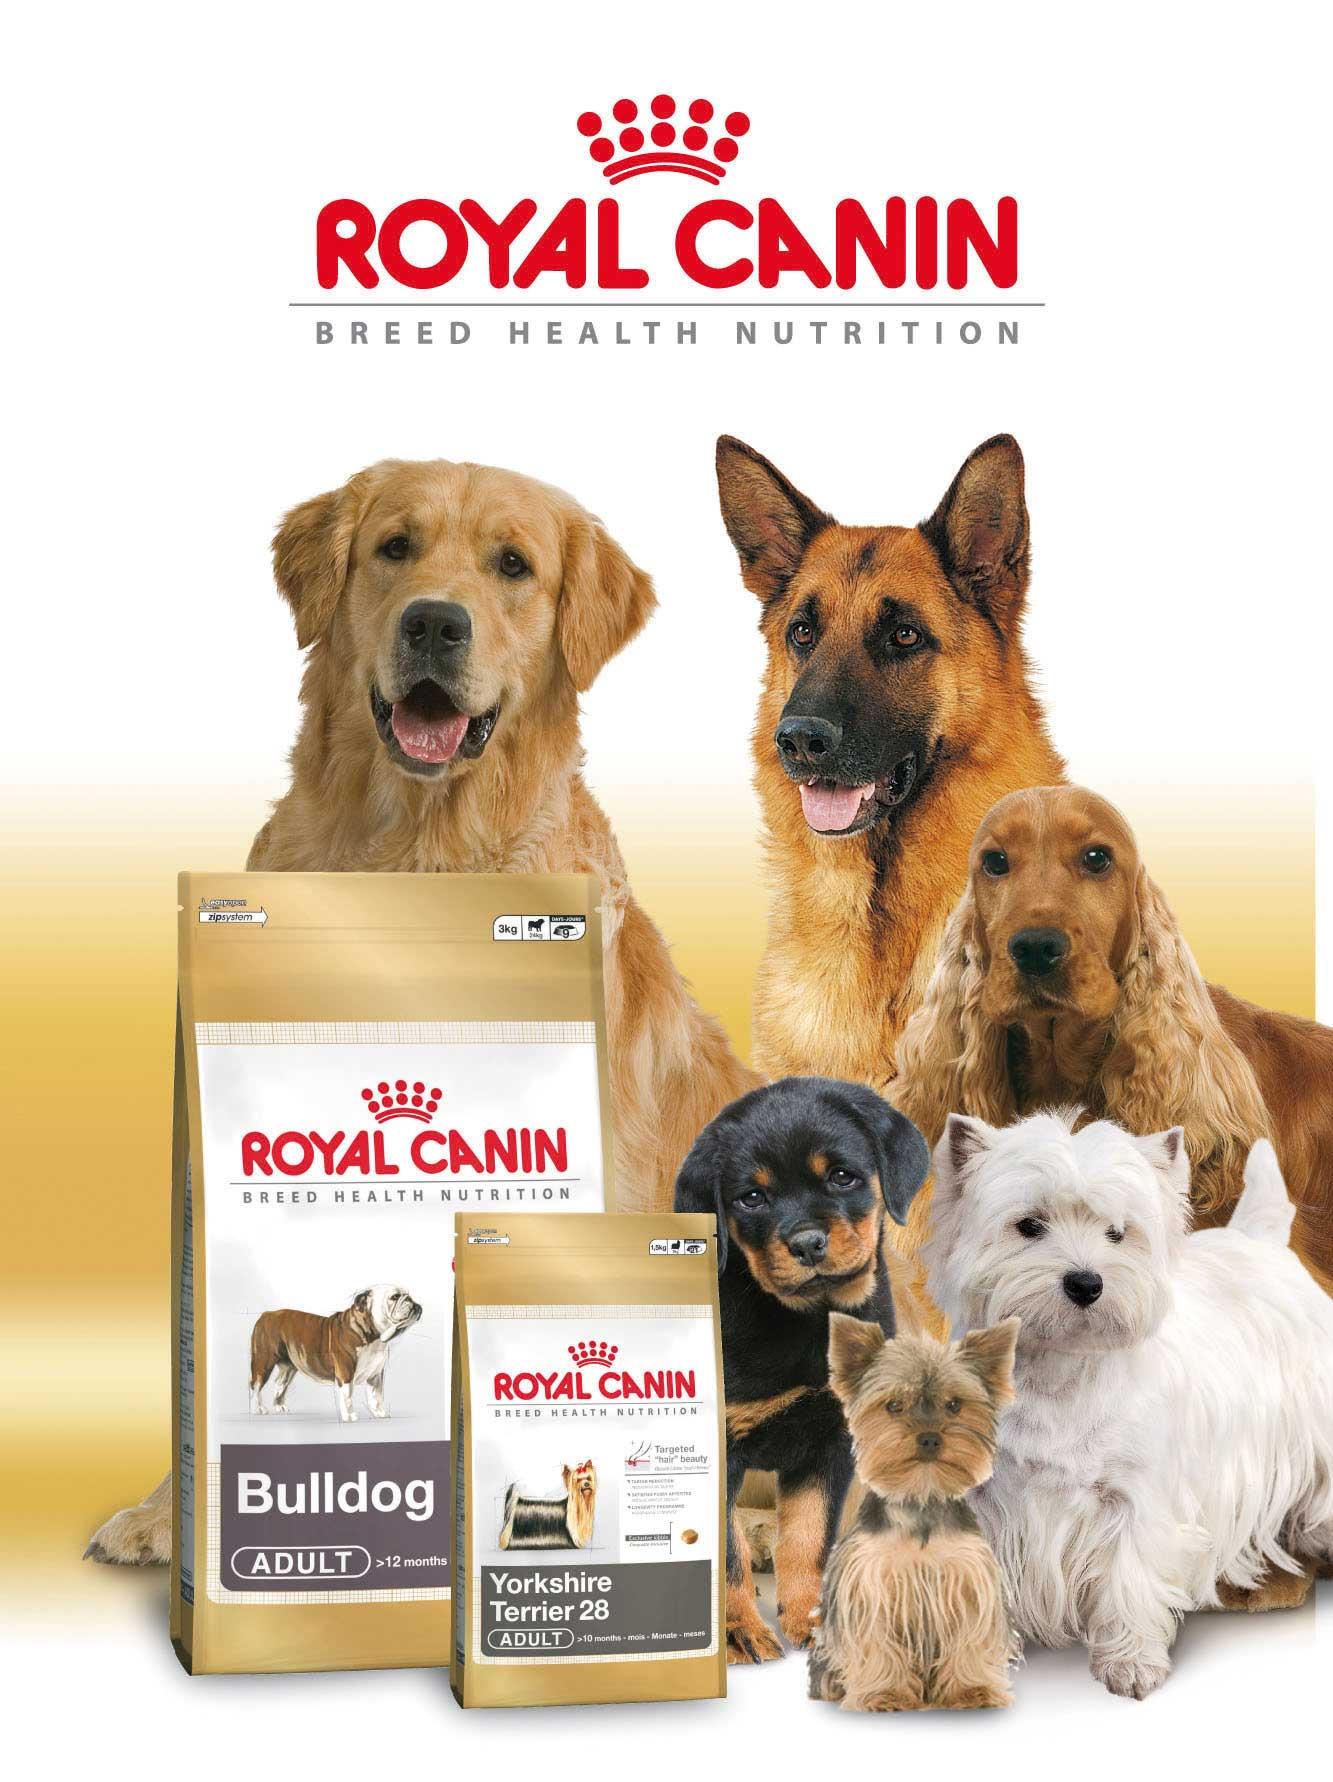 Как выбрать корма Royal Canin